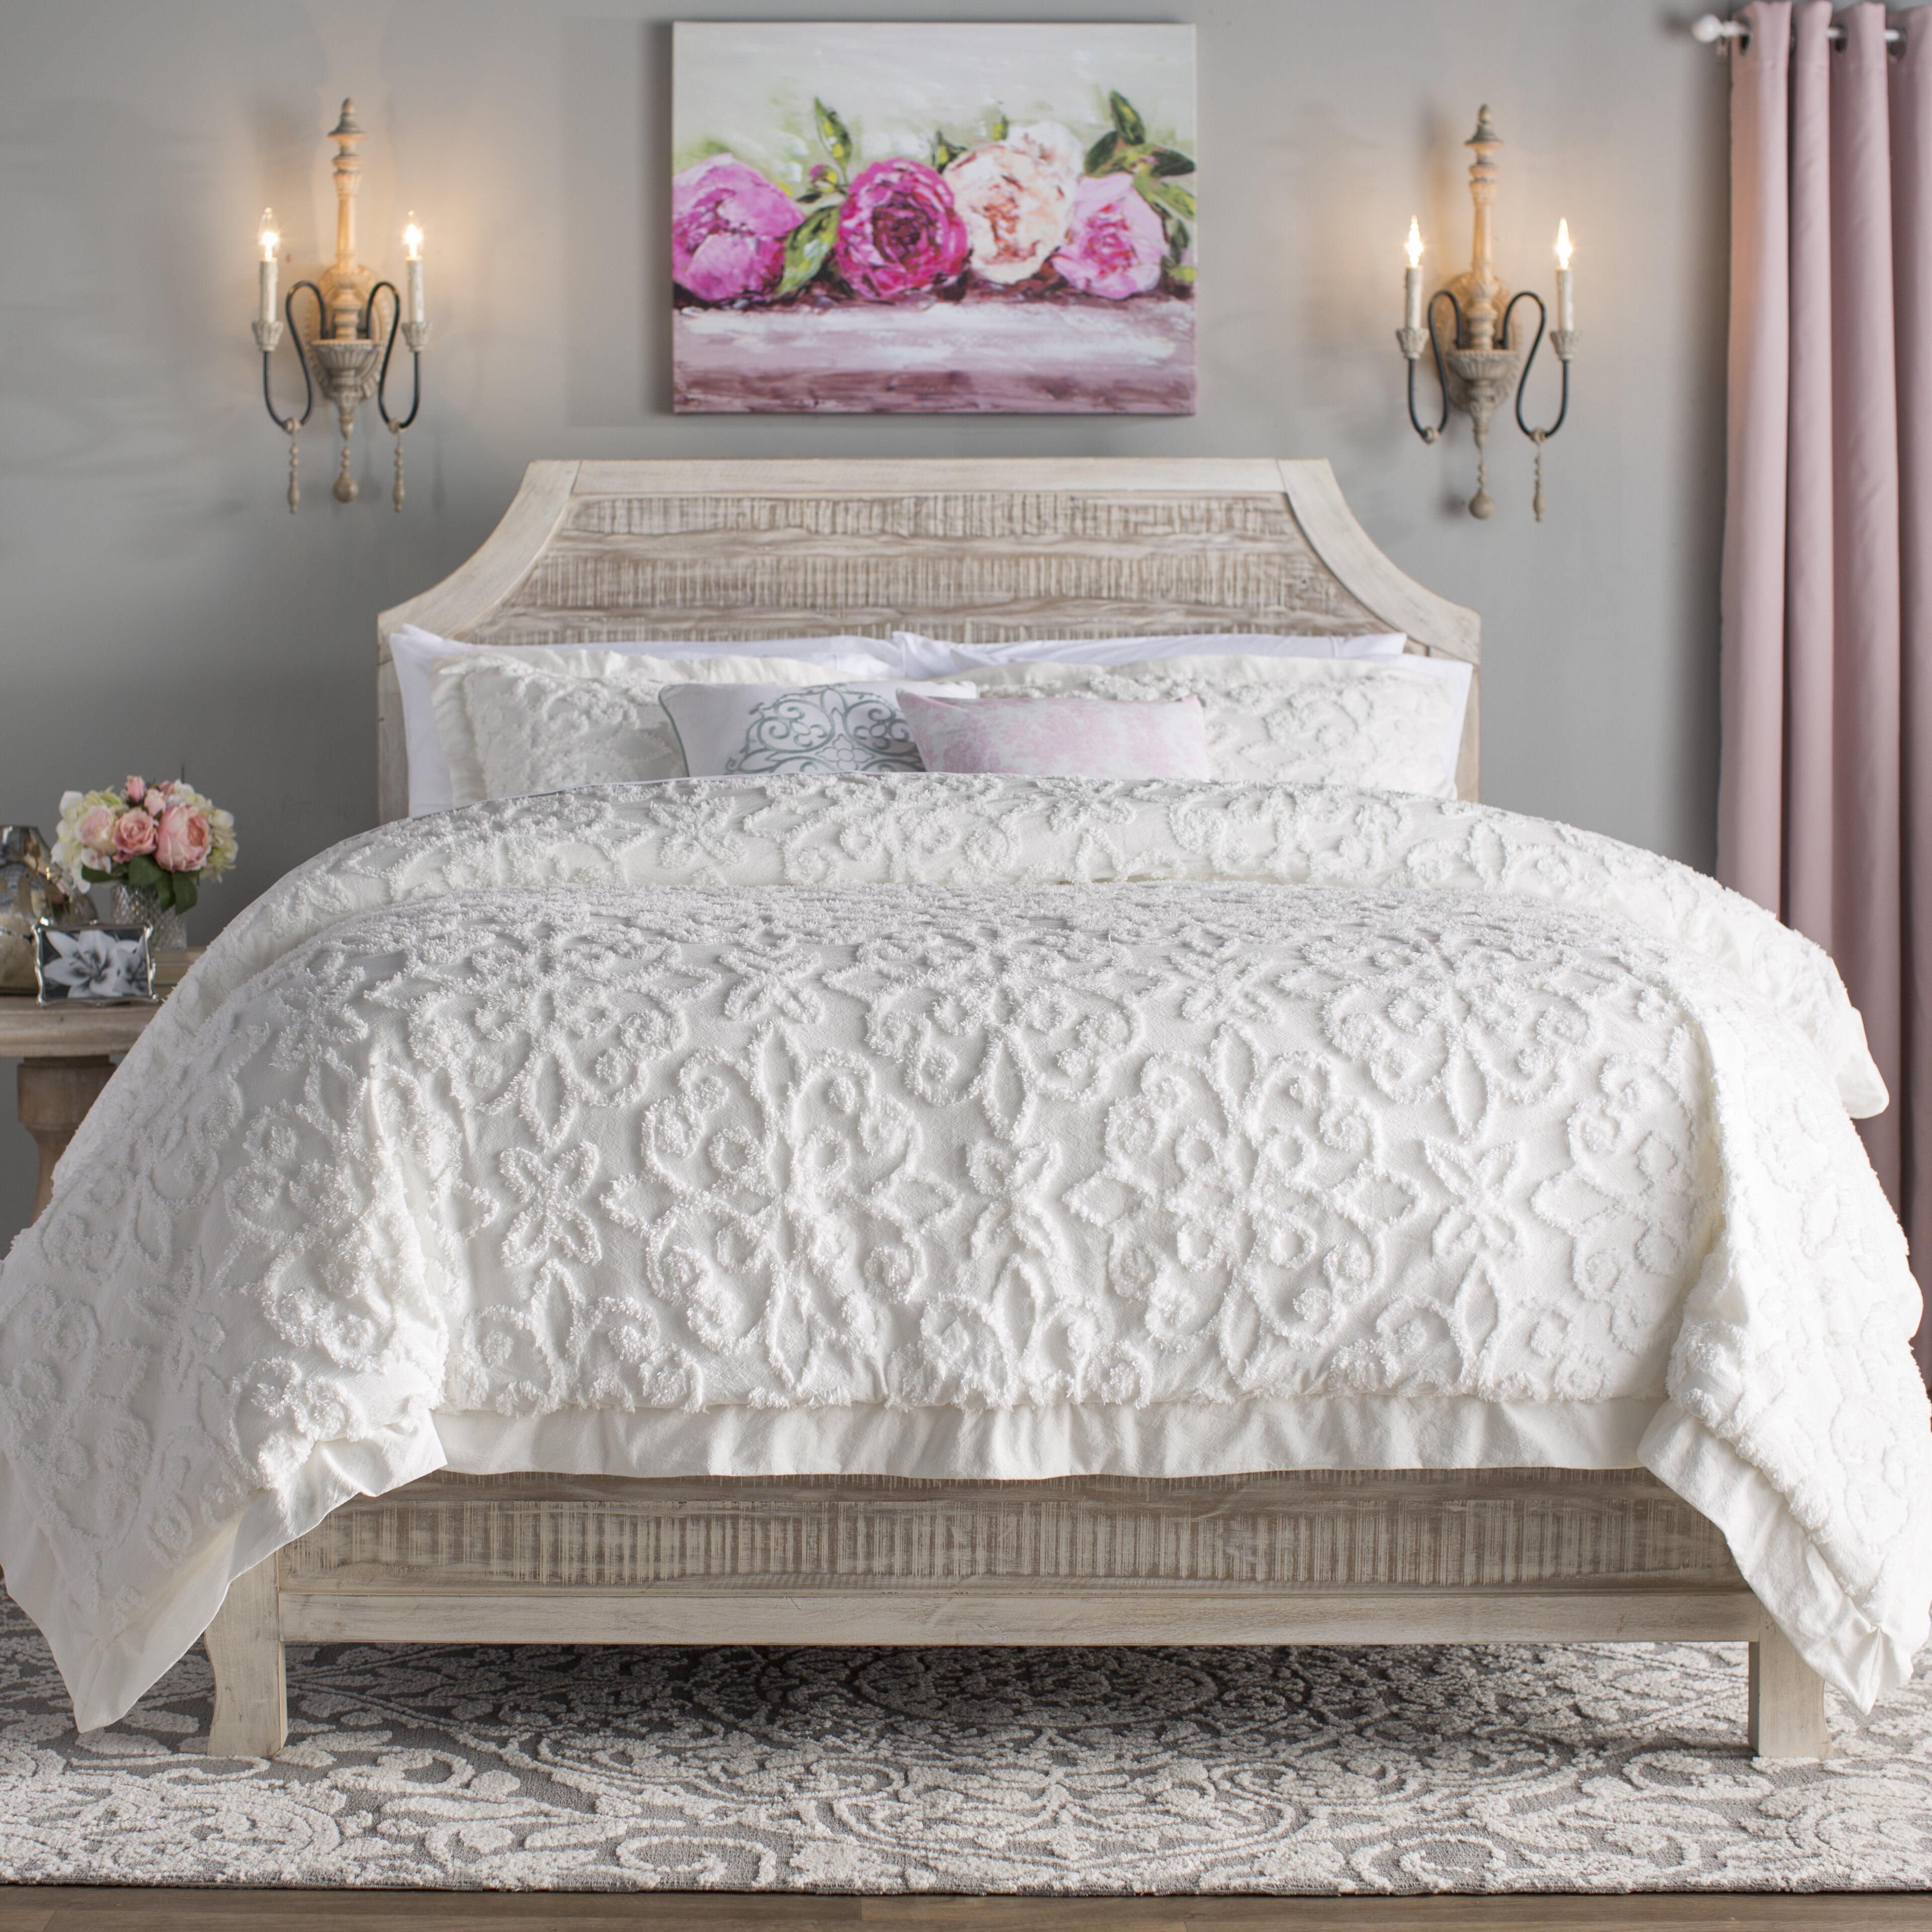 fb7eccfb7b5b1e Ophelia & Co. Keeney Comforter Set & Reviews   Wayfair